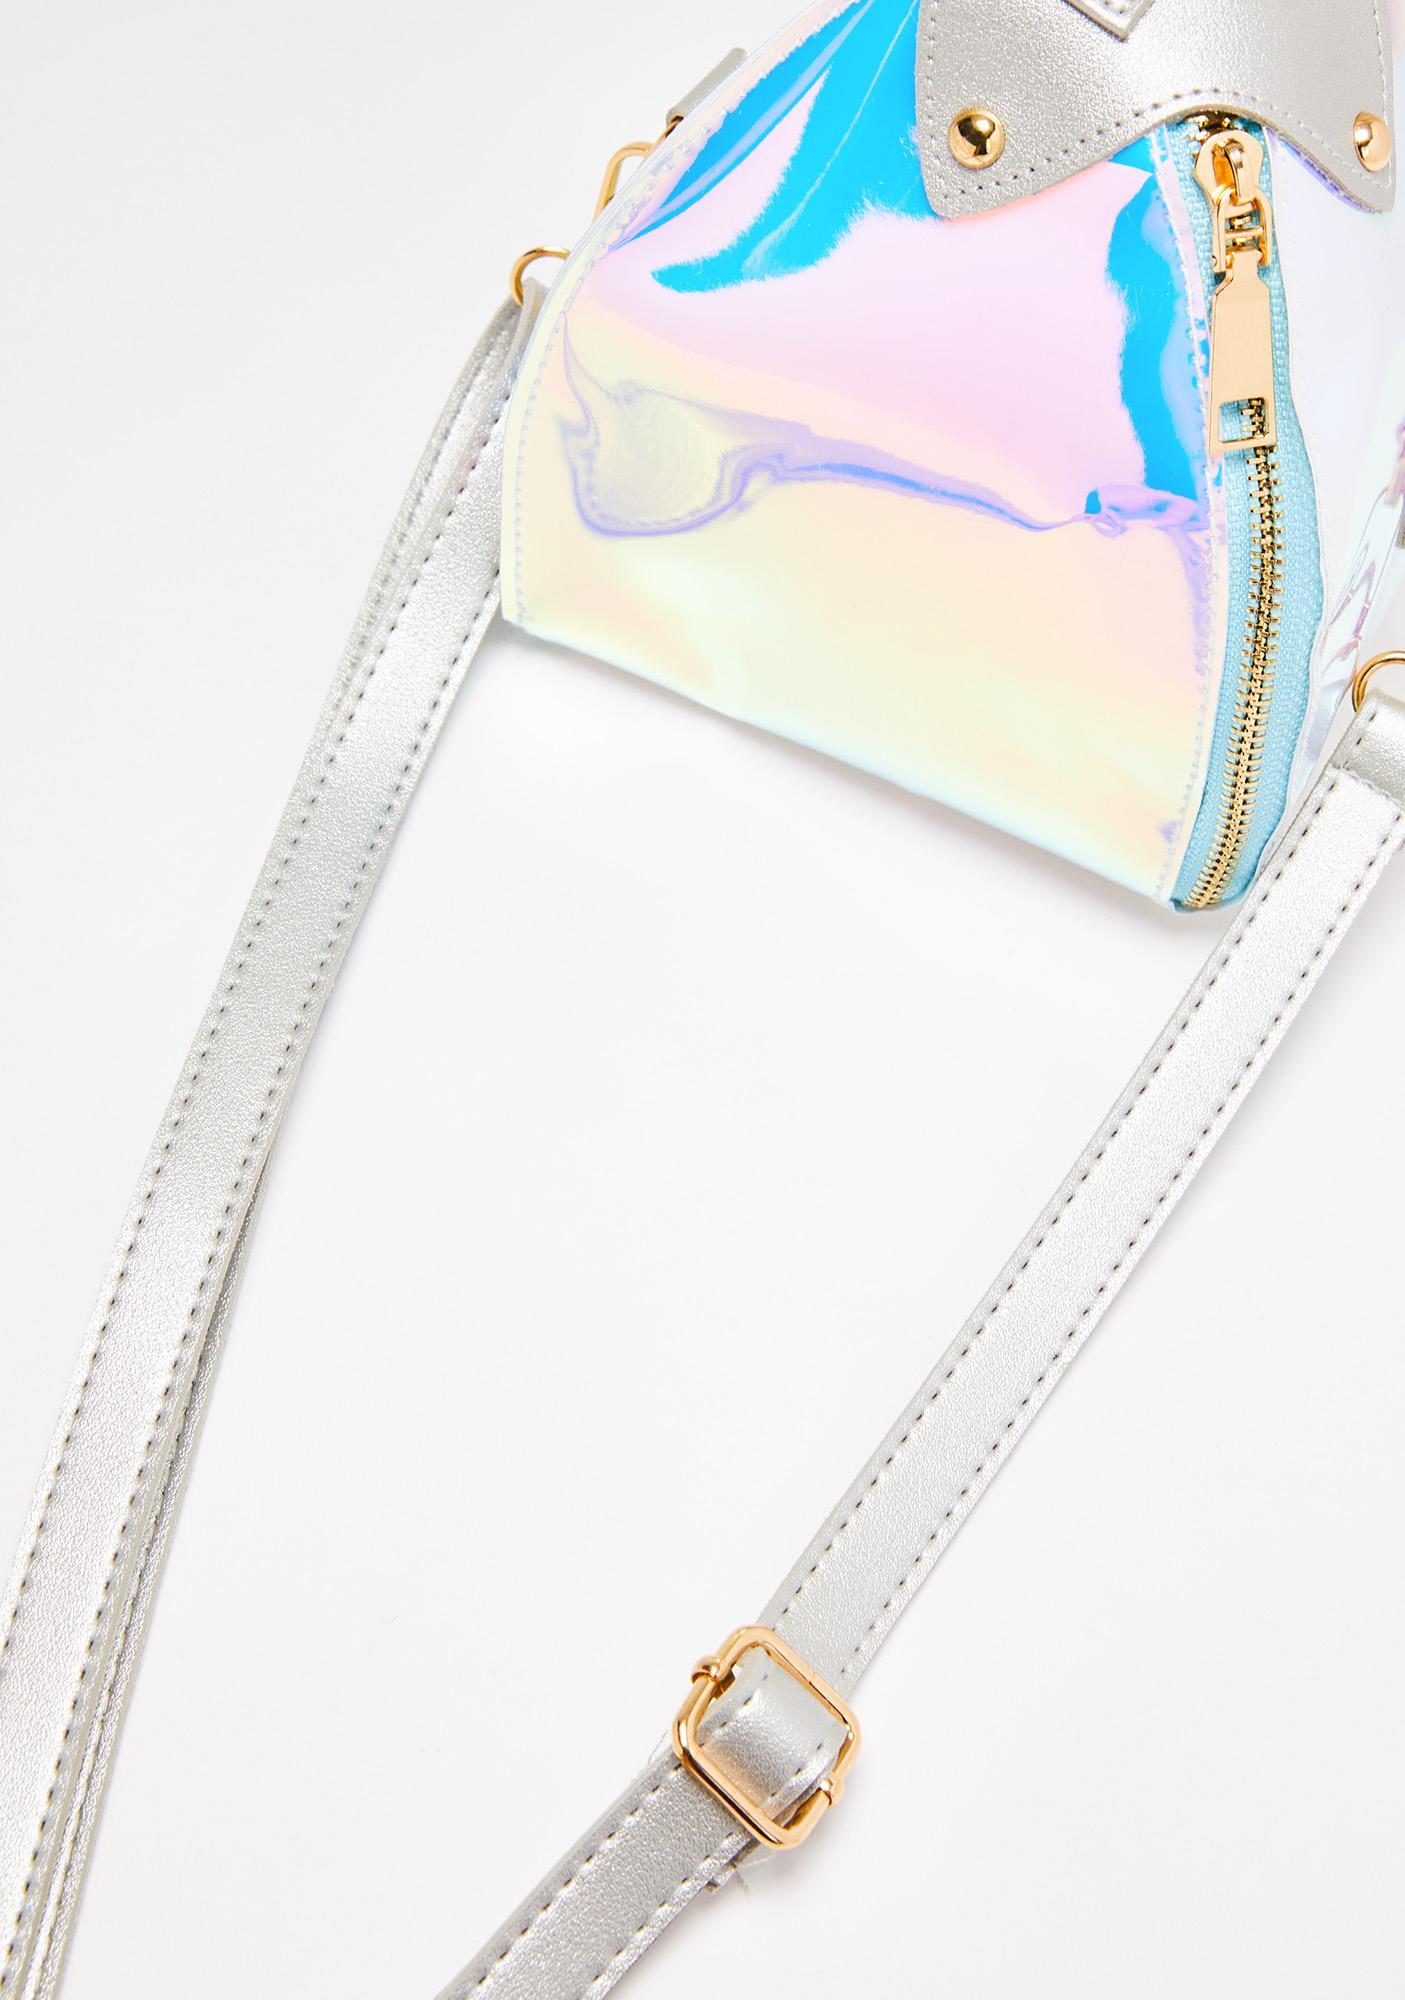 Stardust Reign Holographic Handbag